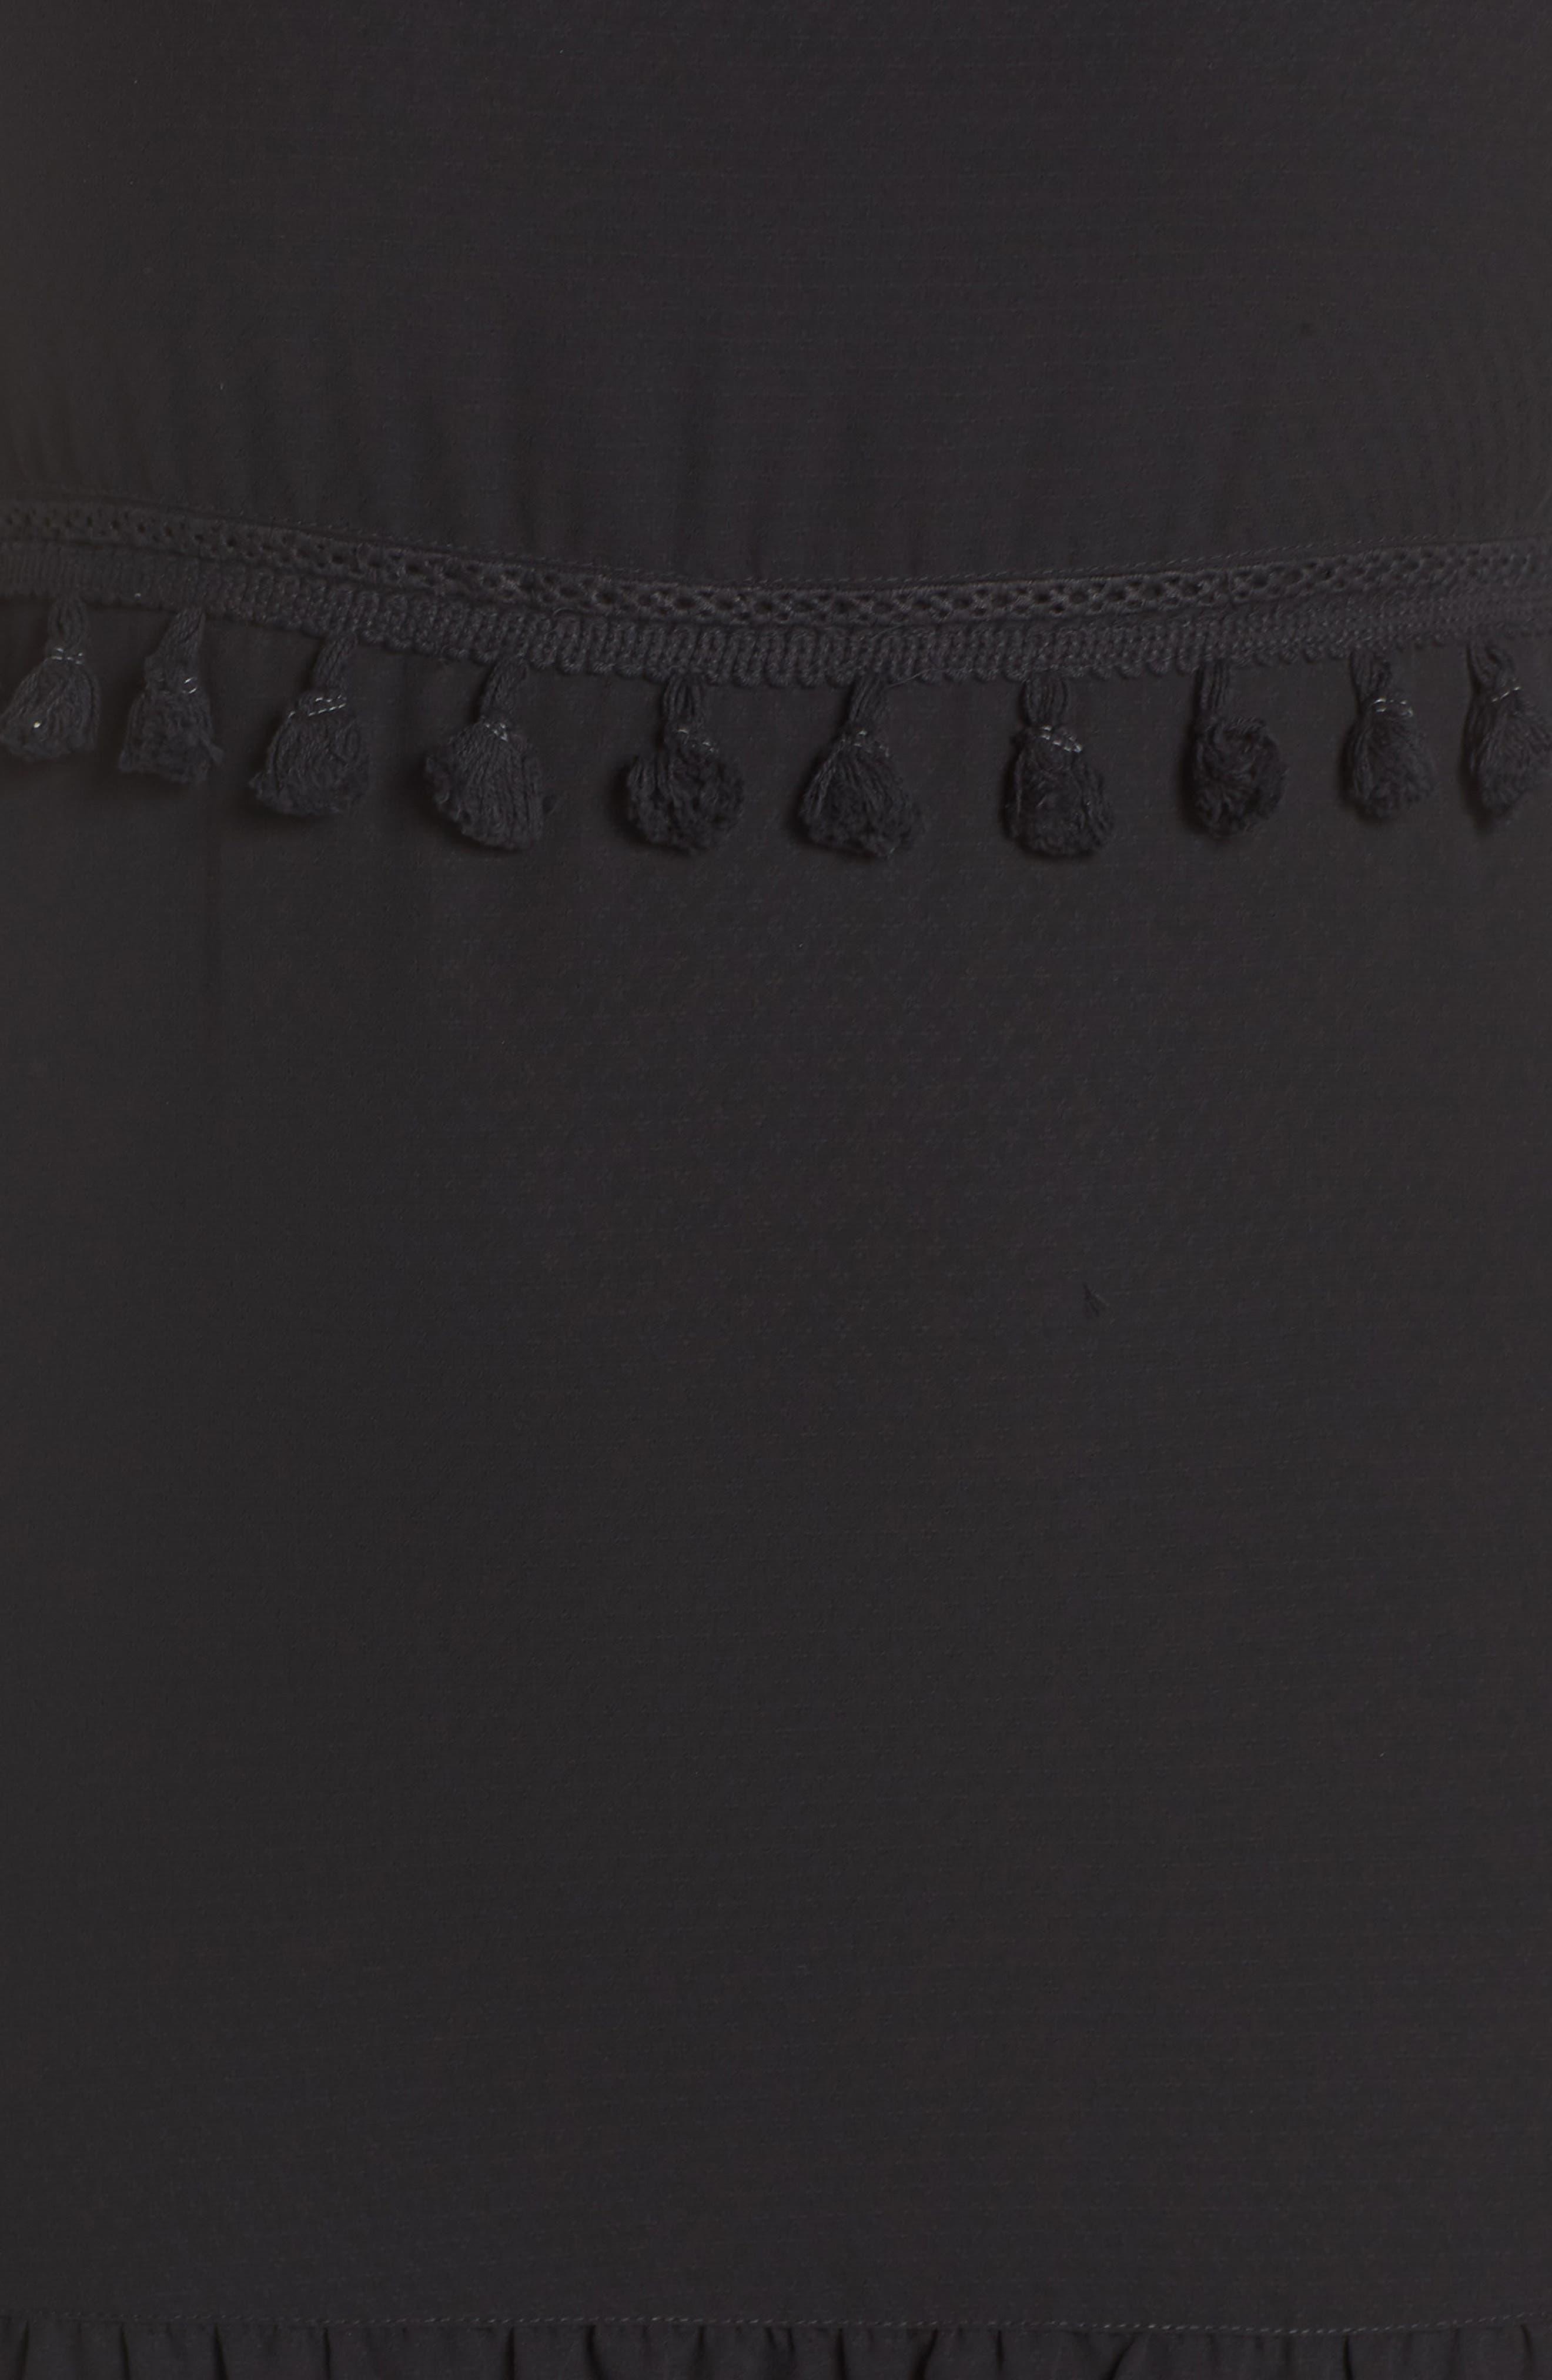 Tassel Trim Sheer Hem Dress,                             Alternate thumbnail 5, color,                             001